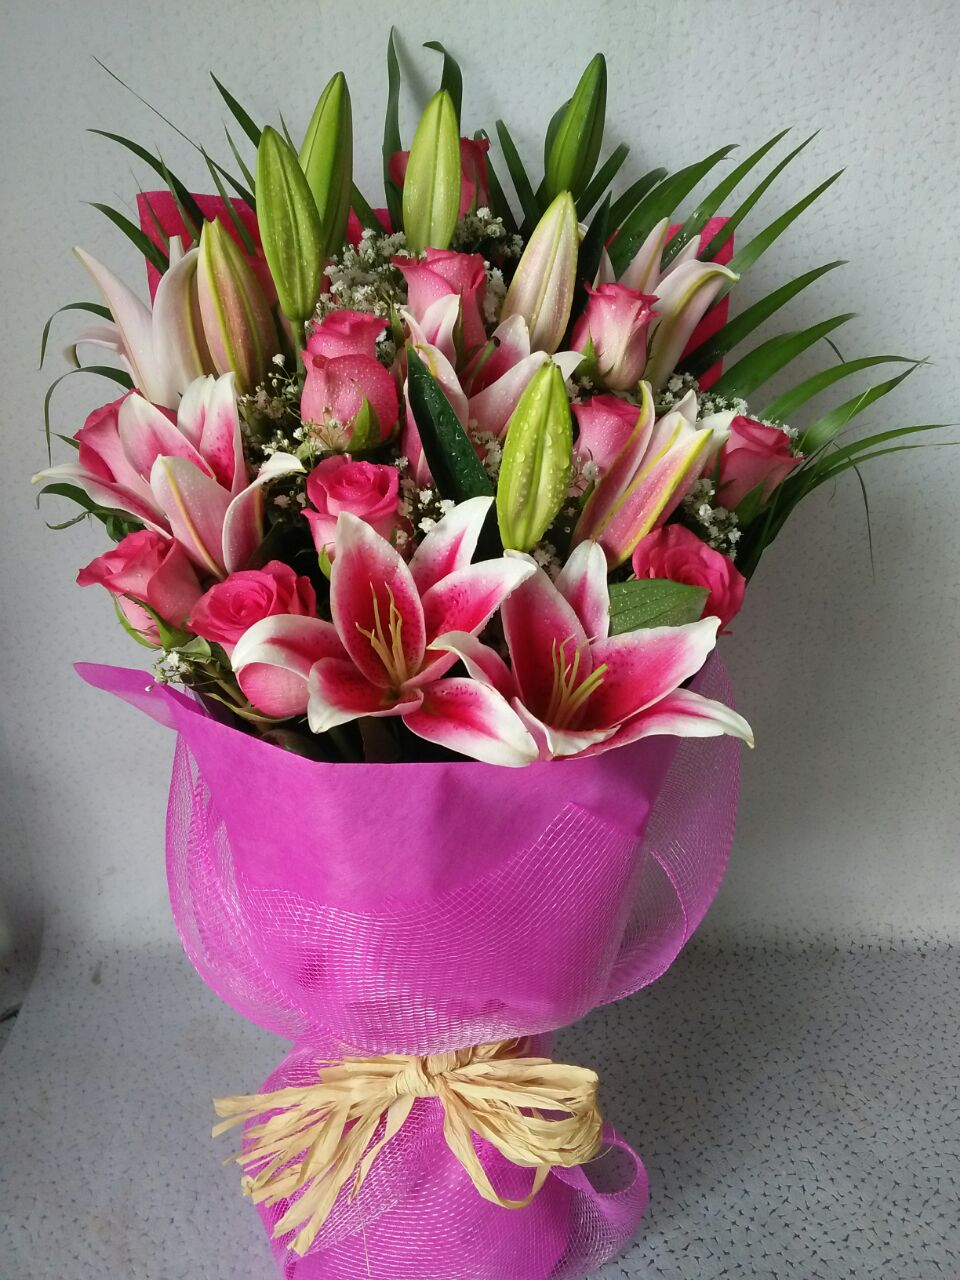 Veracity Pink Roses Lilies Premium Hand Bouquet